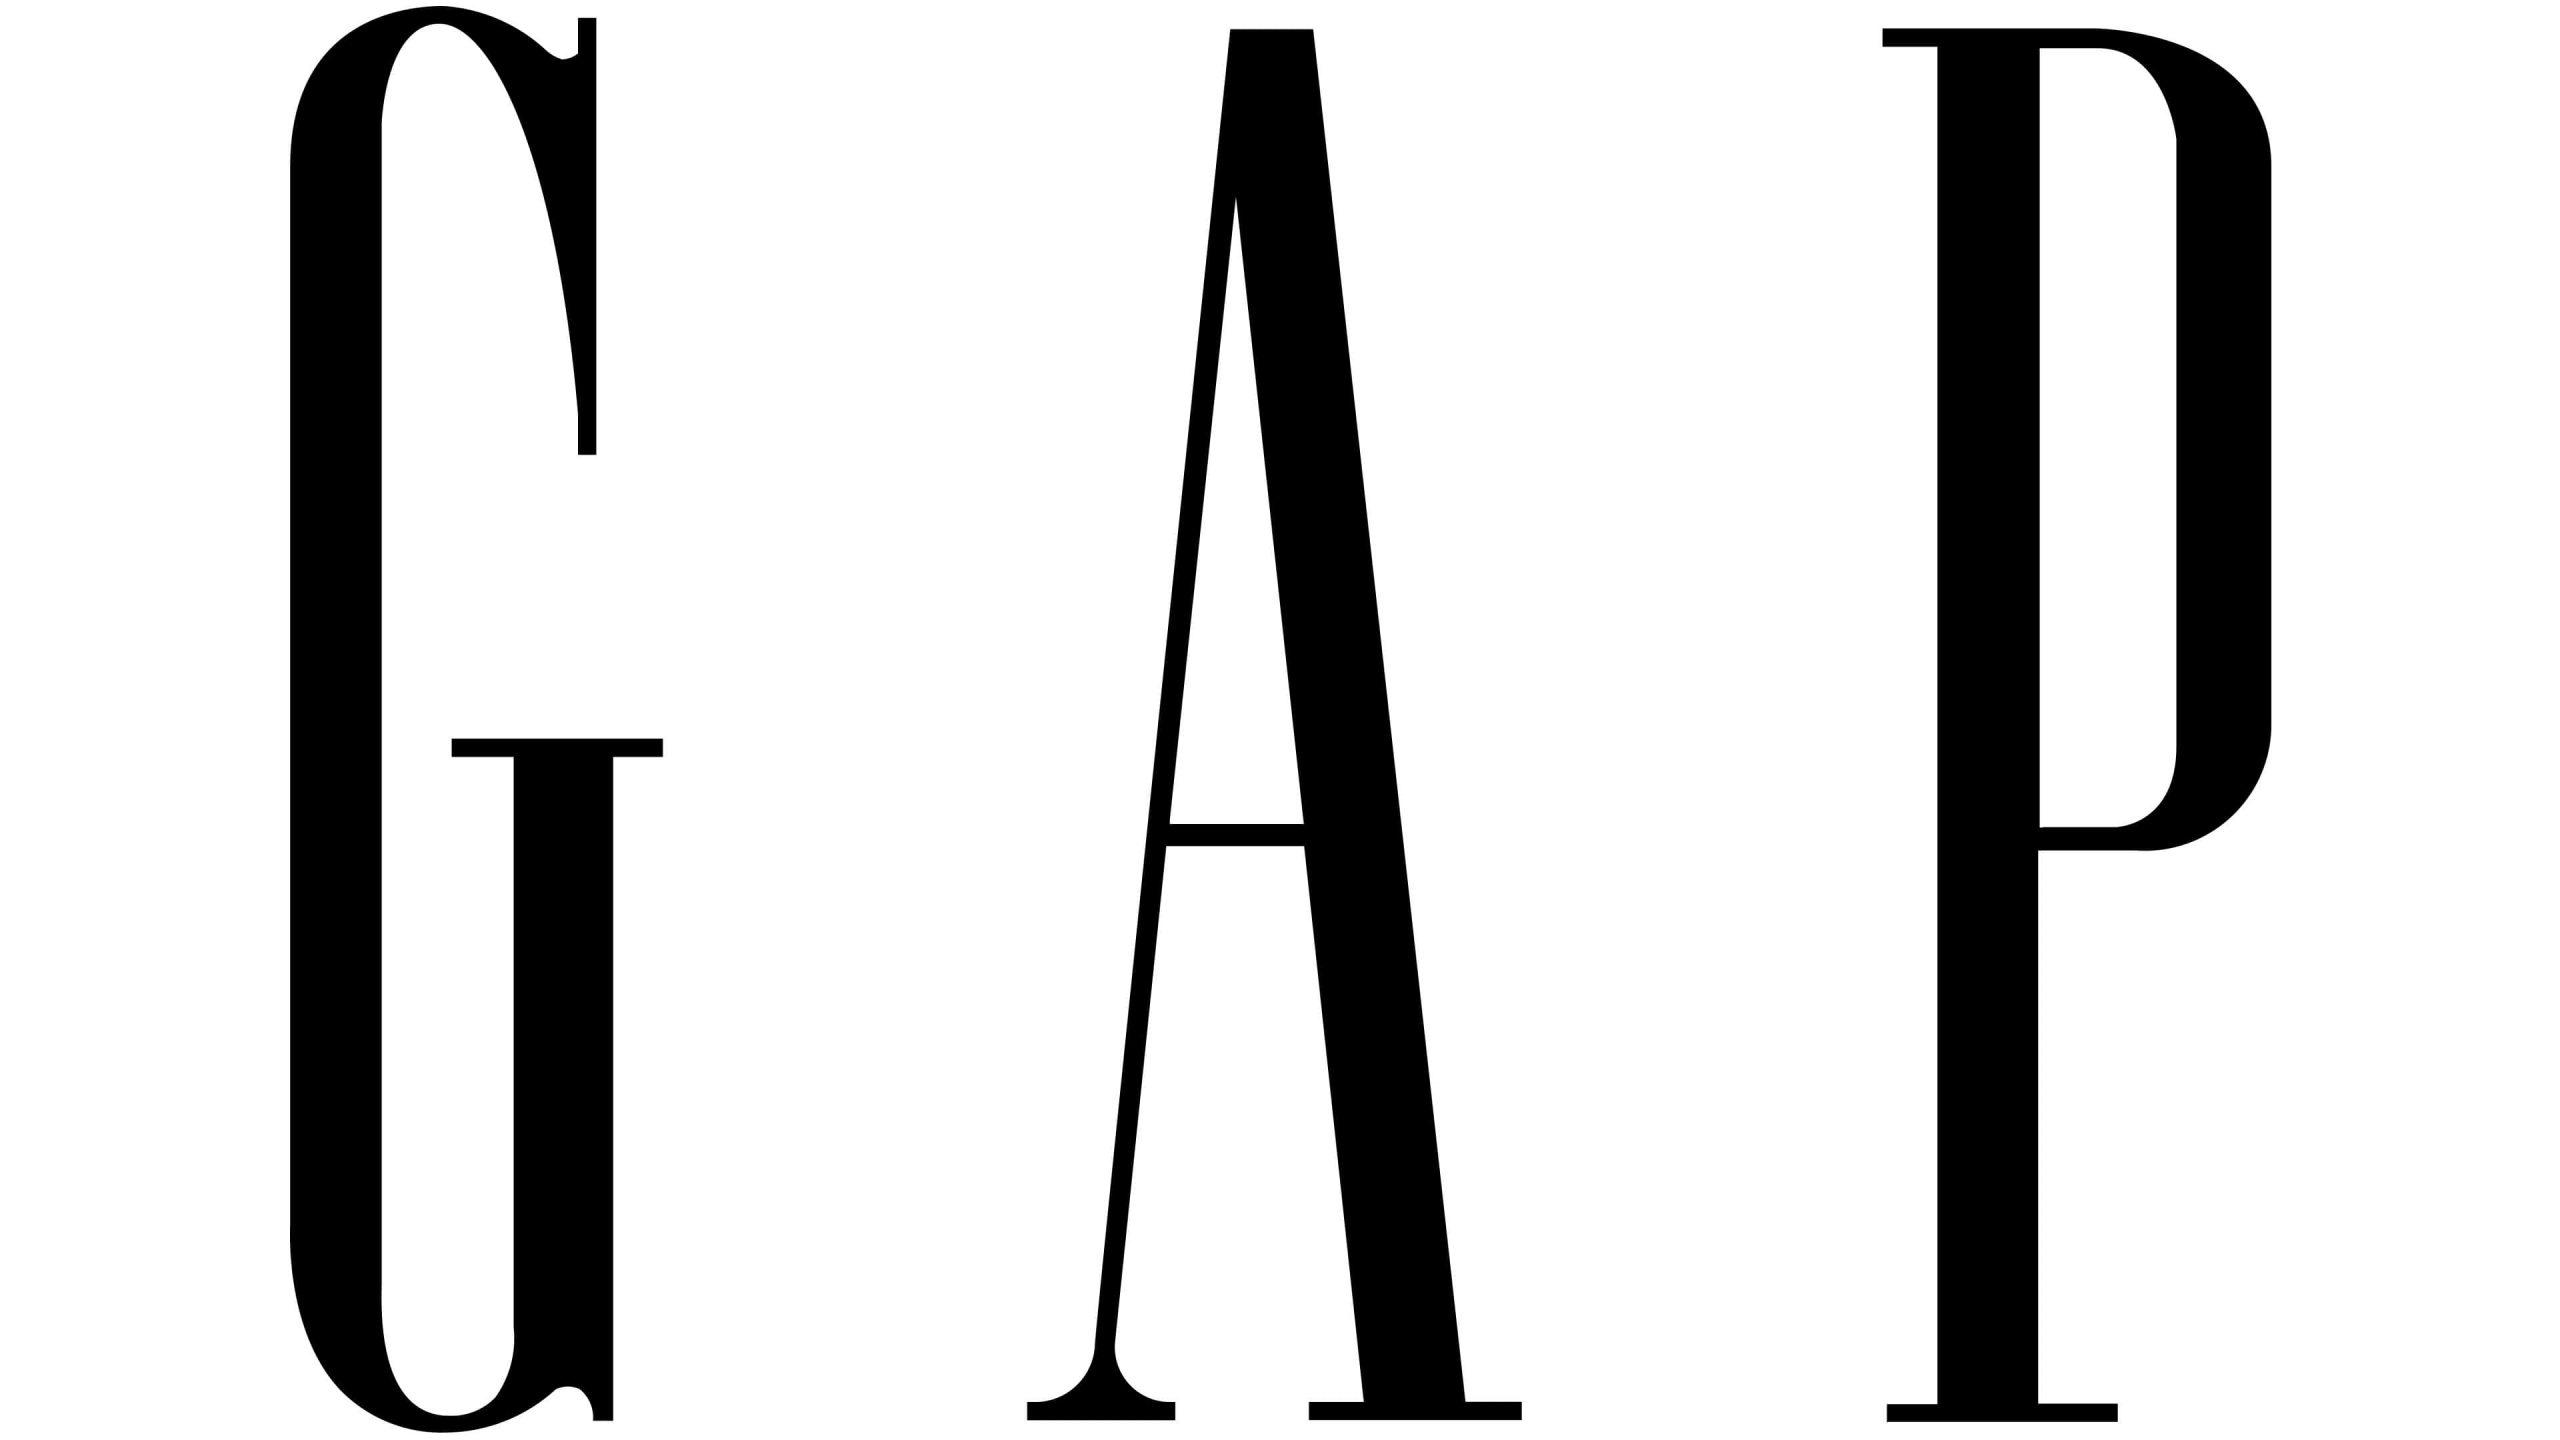 Gap - instructional design client logo